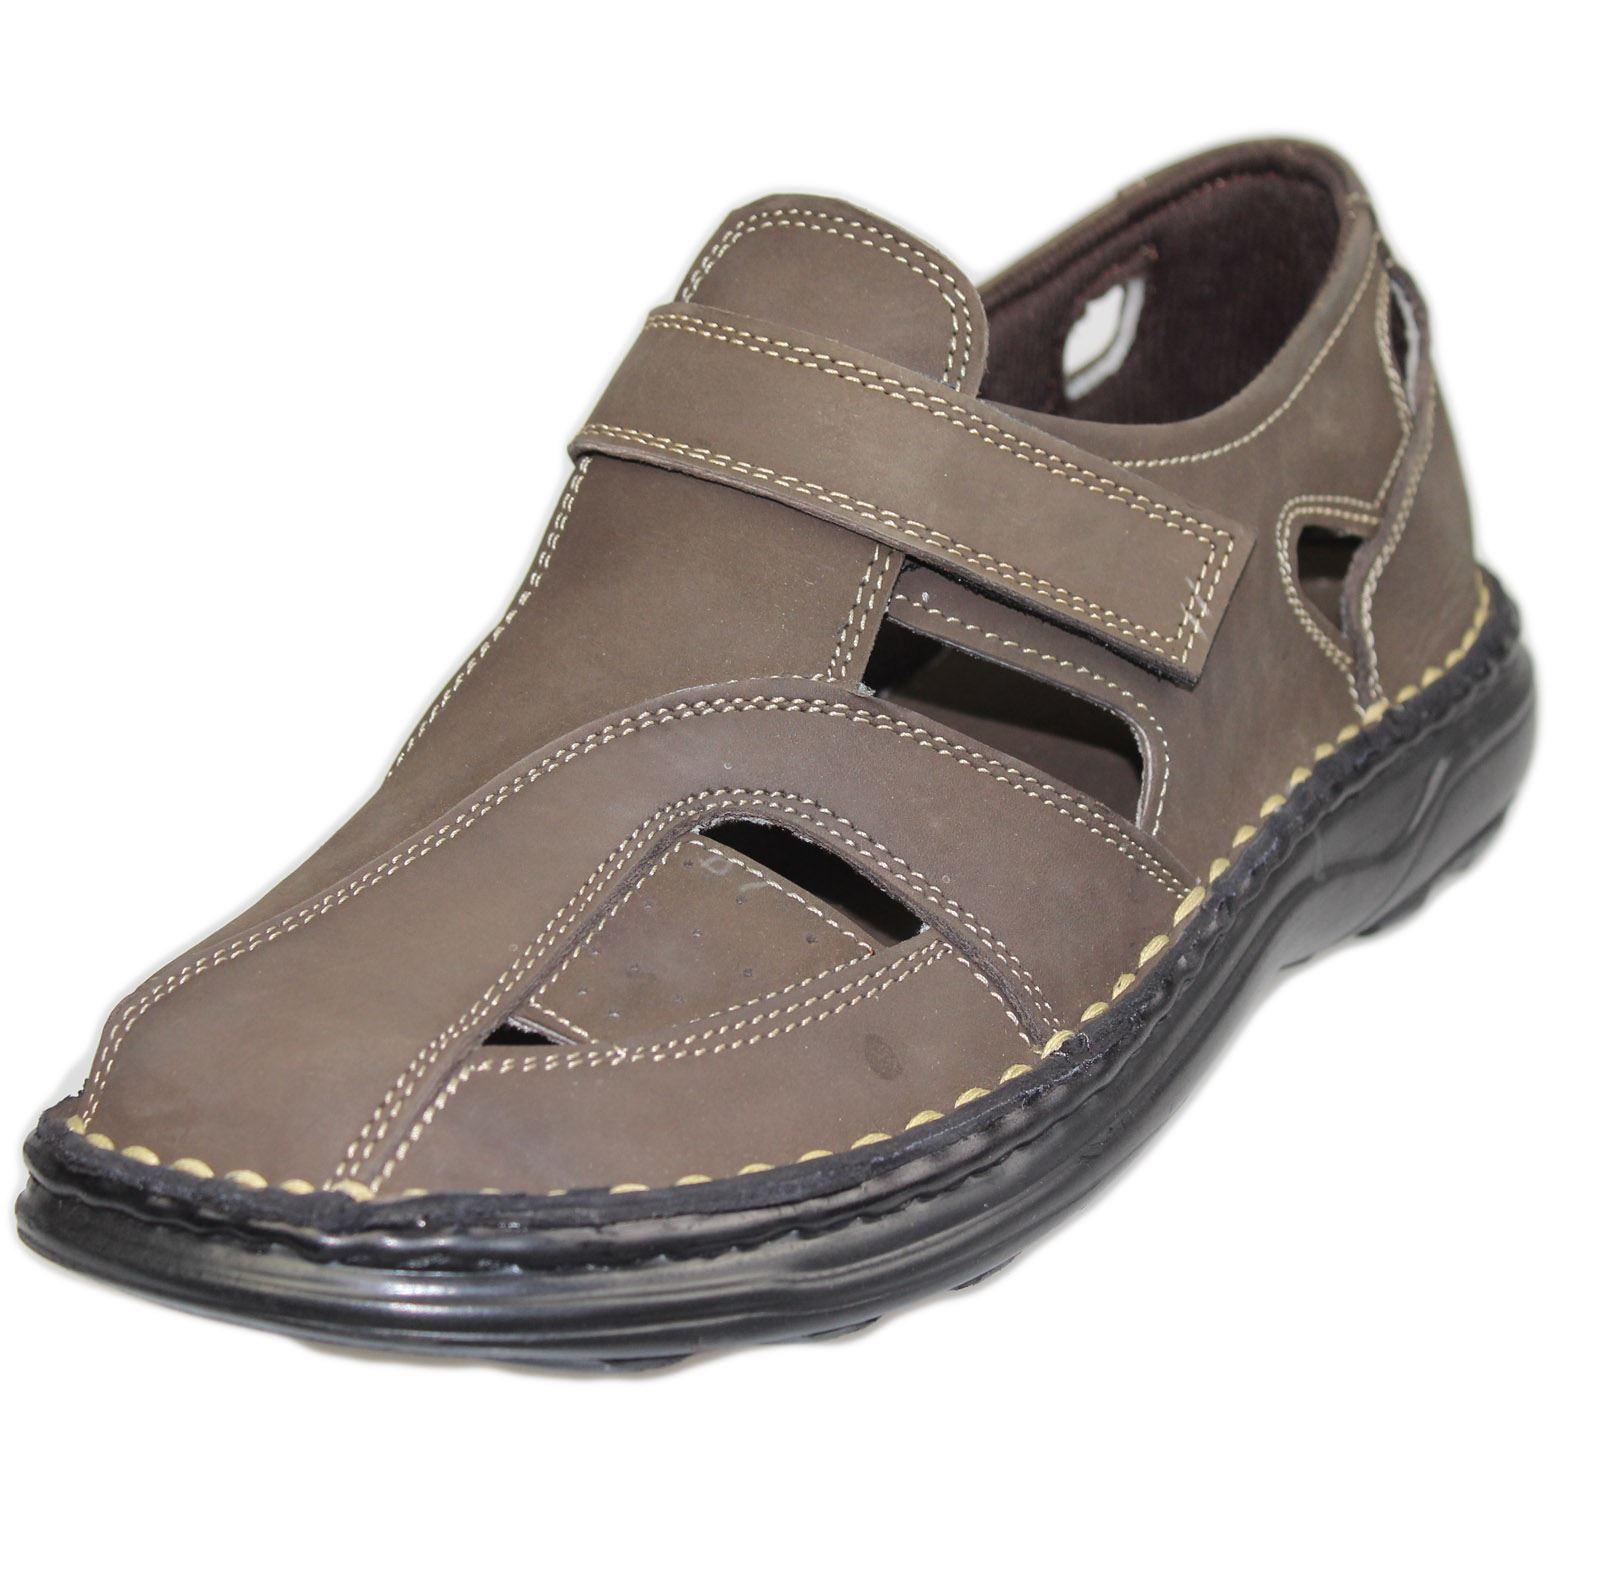 Mens Sandals Walking Fashion Casual Summer Beach Leather ...